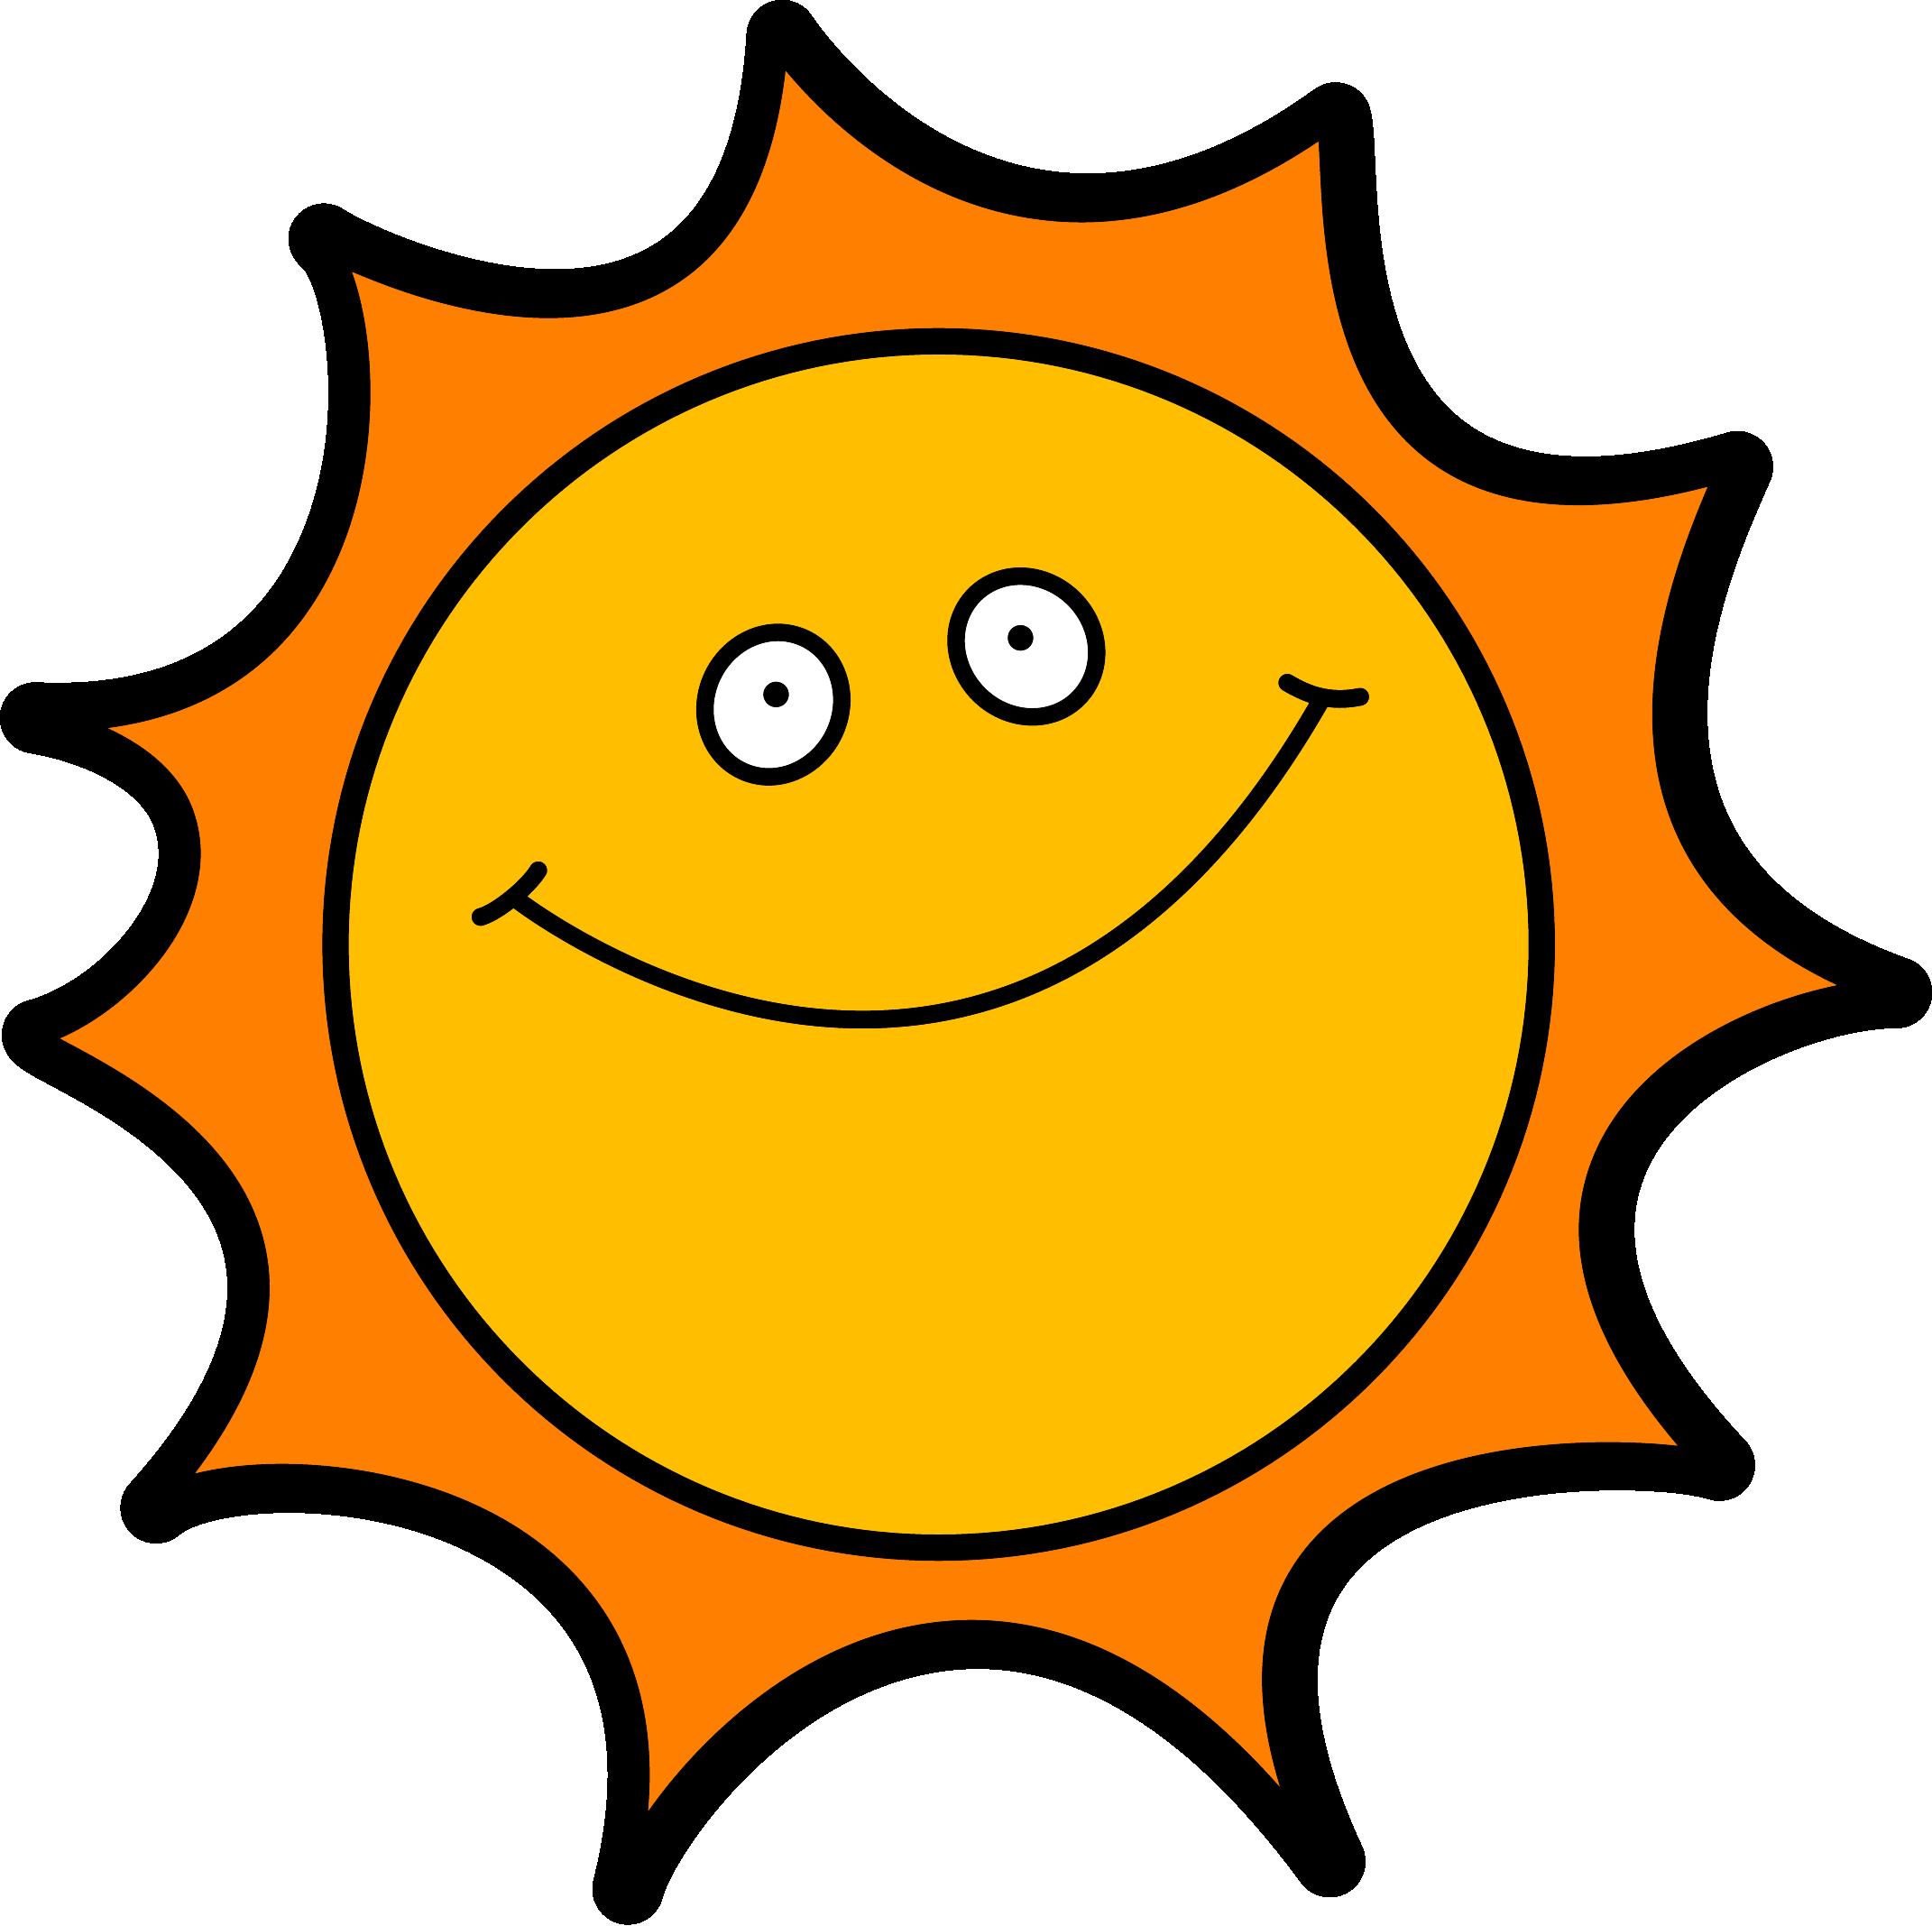 2142x2135 Sunshine Sad Sun Clip Art Free Clipart Images Cliparting 3